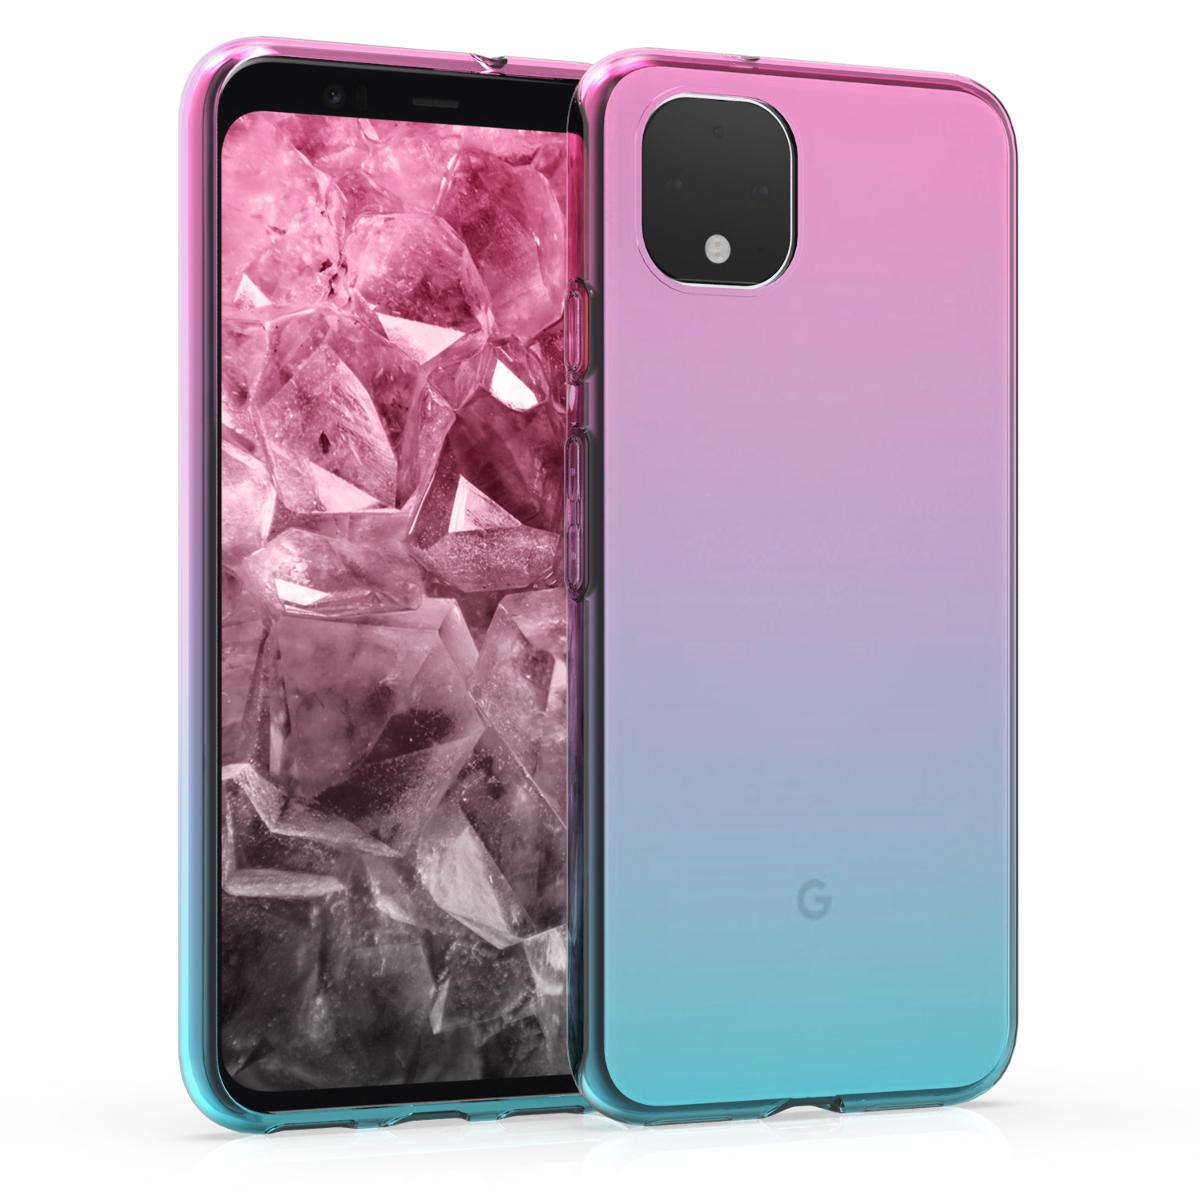 KW Θήκη Σιλικόνης Google Pixel 4 - Dark Pink / Blue / Transparent (50757.01)